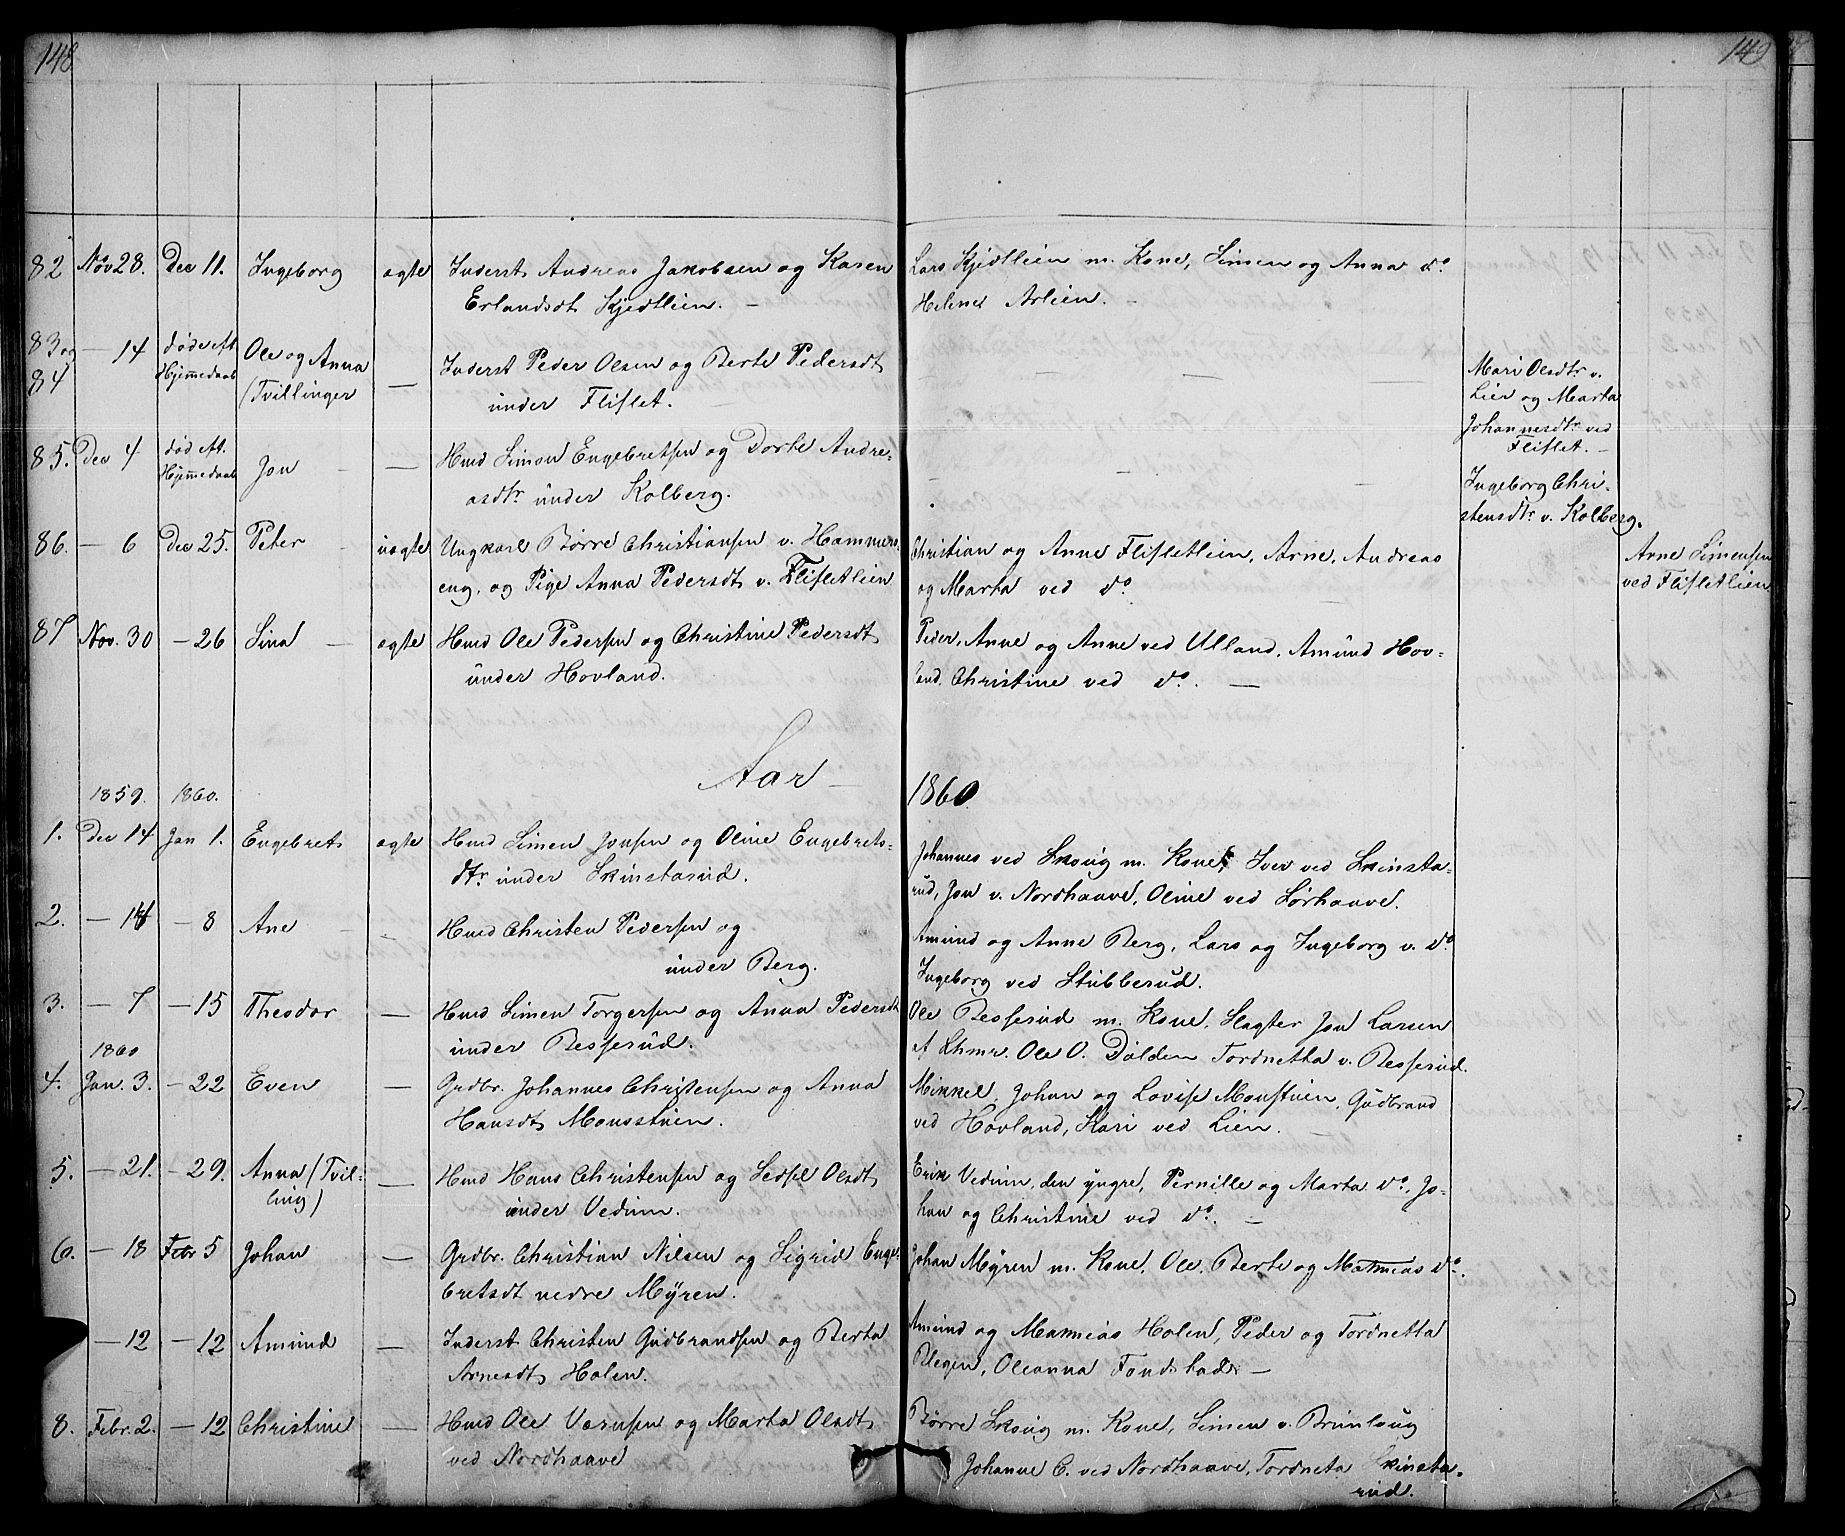 SAH, Fåberg prestekontor, Klokkerbok nr. 5, 1837-1864, s. 148-149